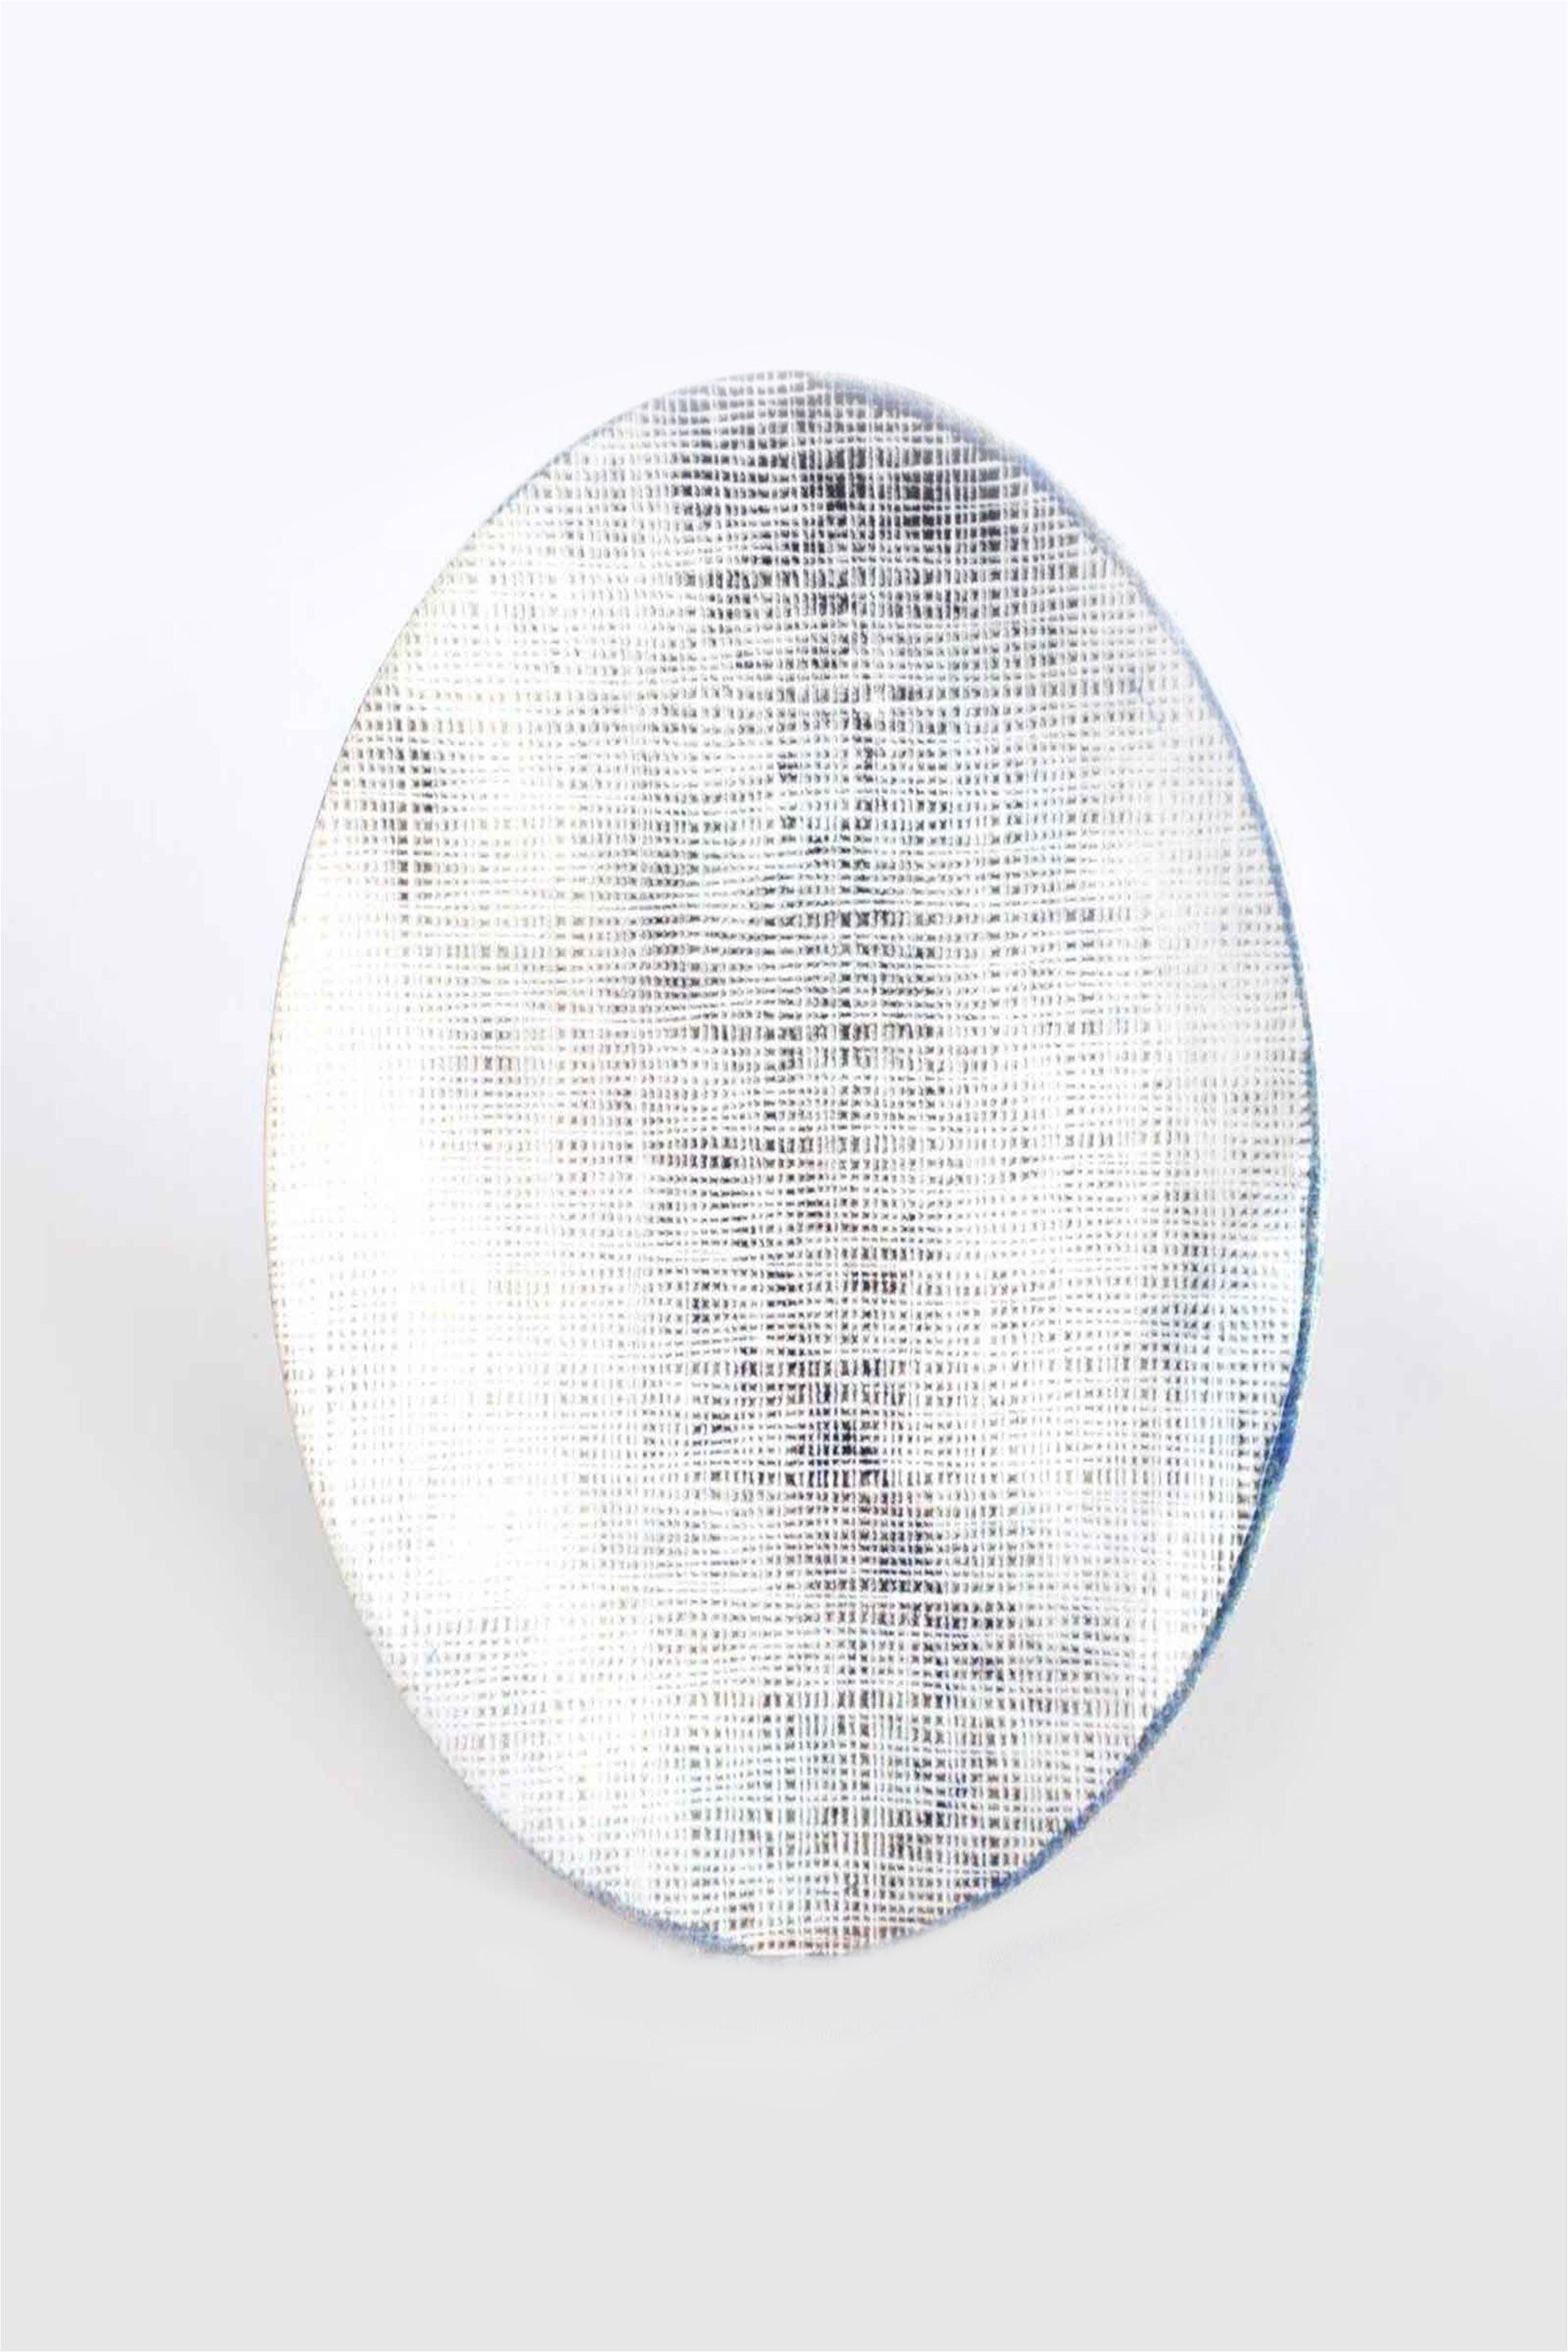 Marva πιάτο φαγητού κεραμικό με διακοσμητικό σχέδιο ''Siena'' 26 cm - 5203116238366 - Γκρι